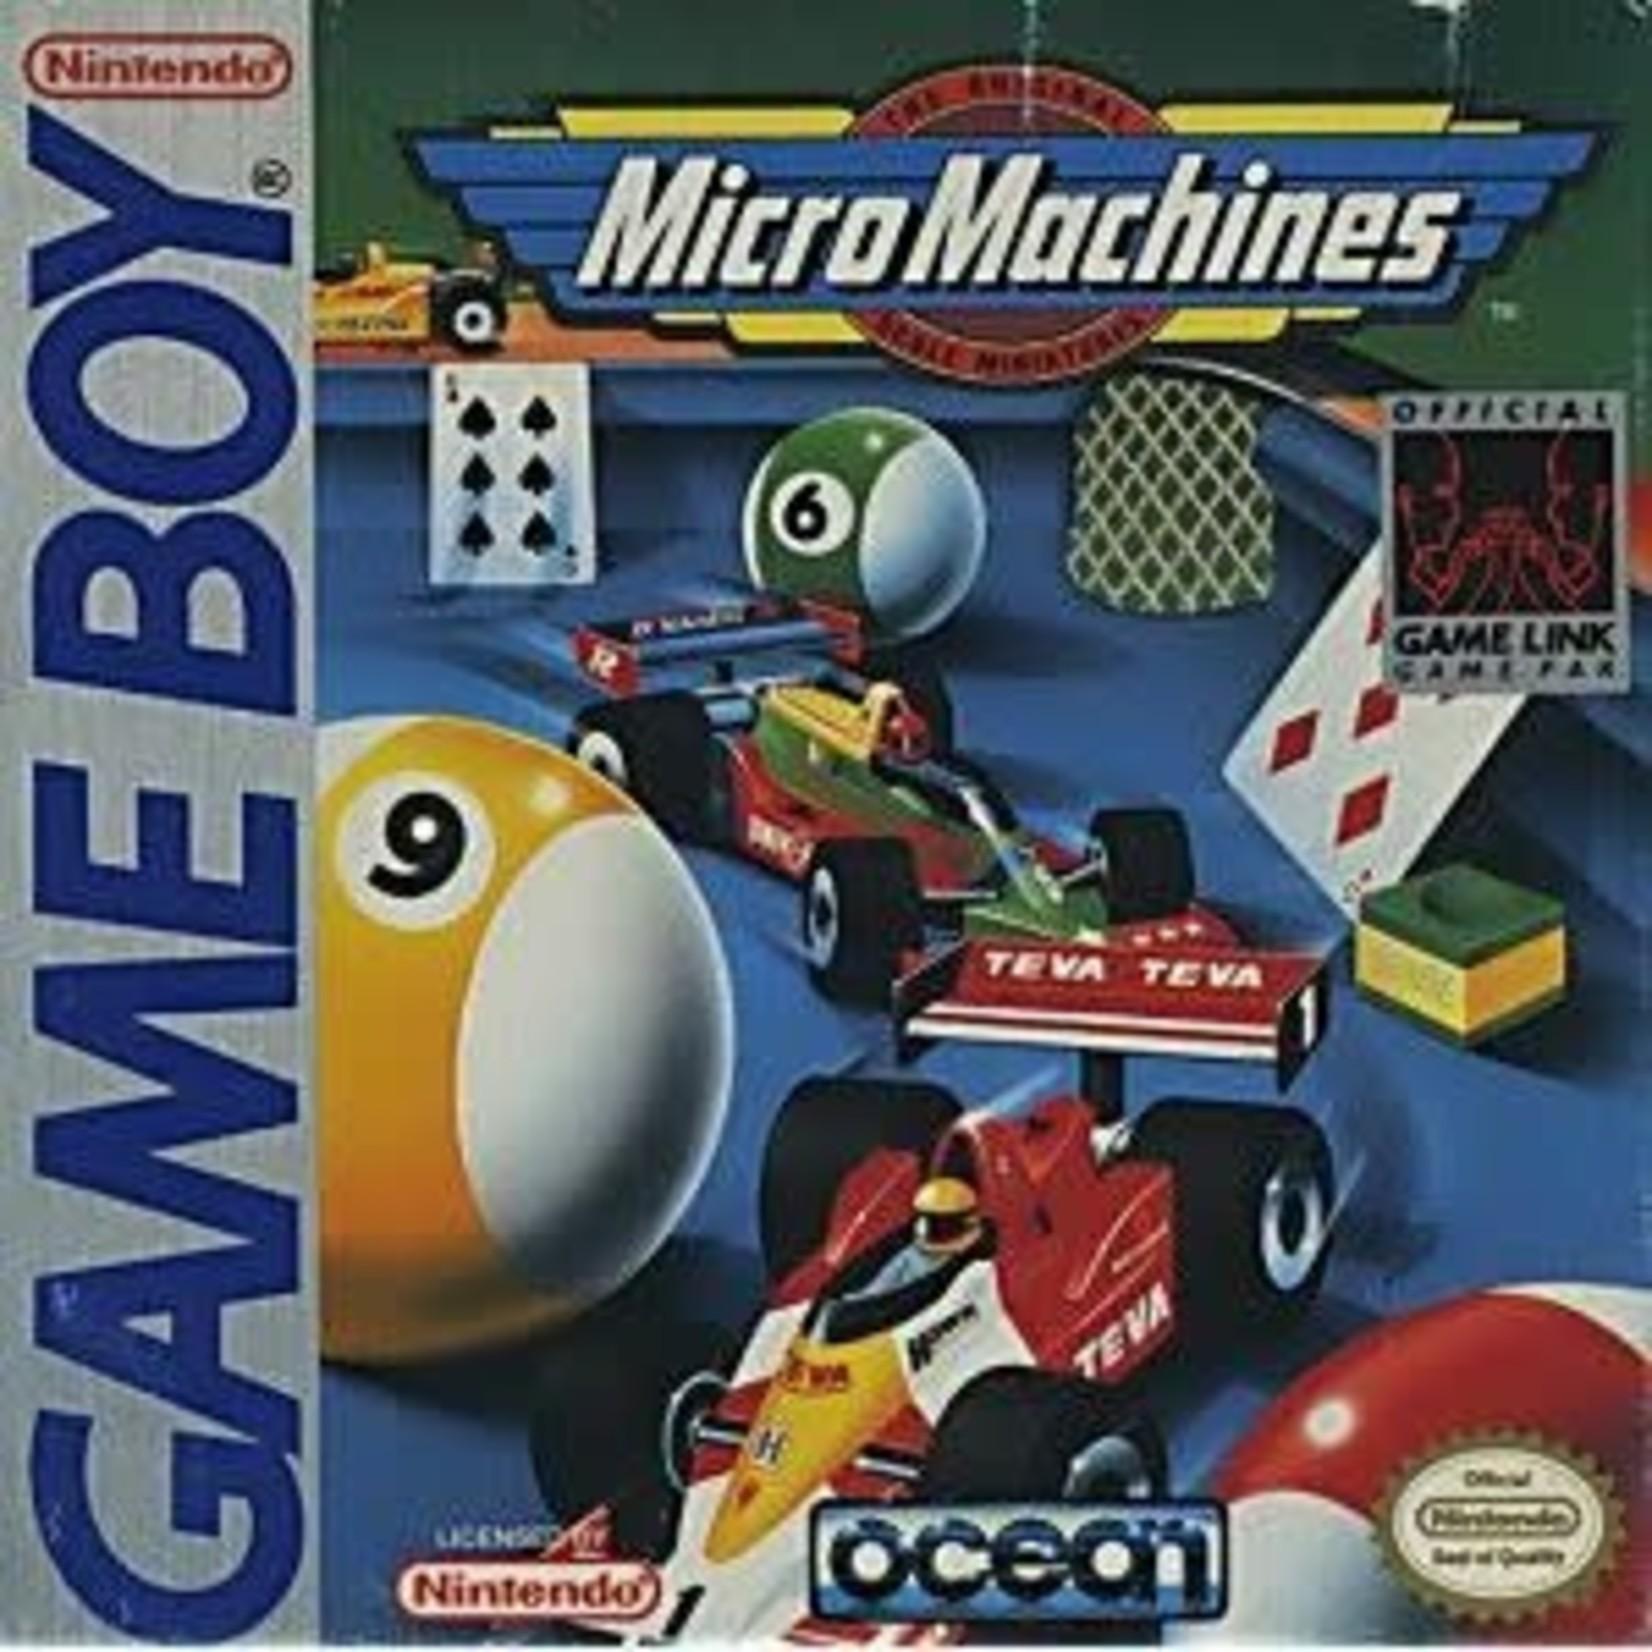 GBU-Micro Machines  (cartridge)